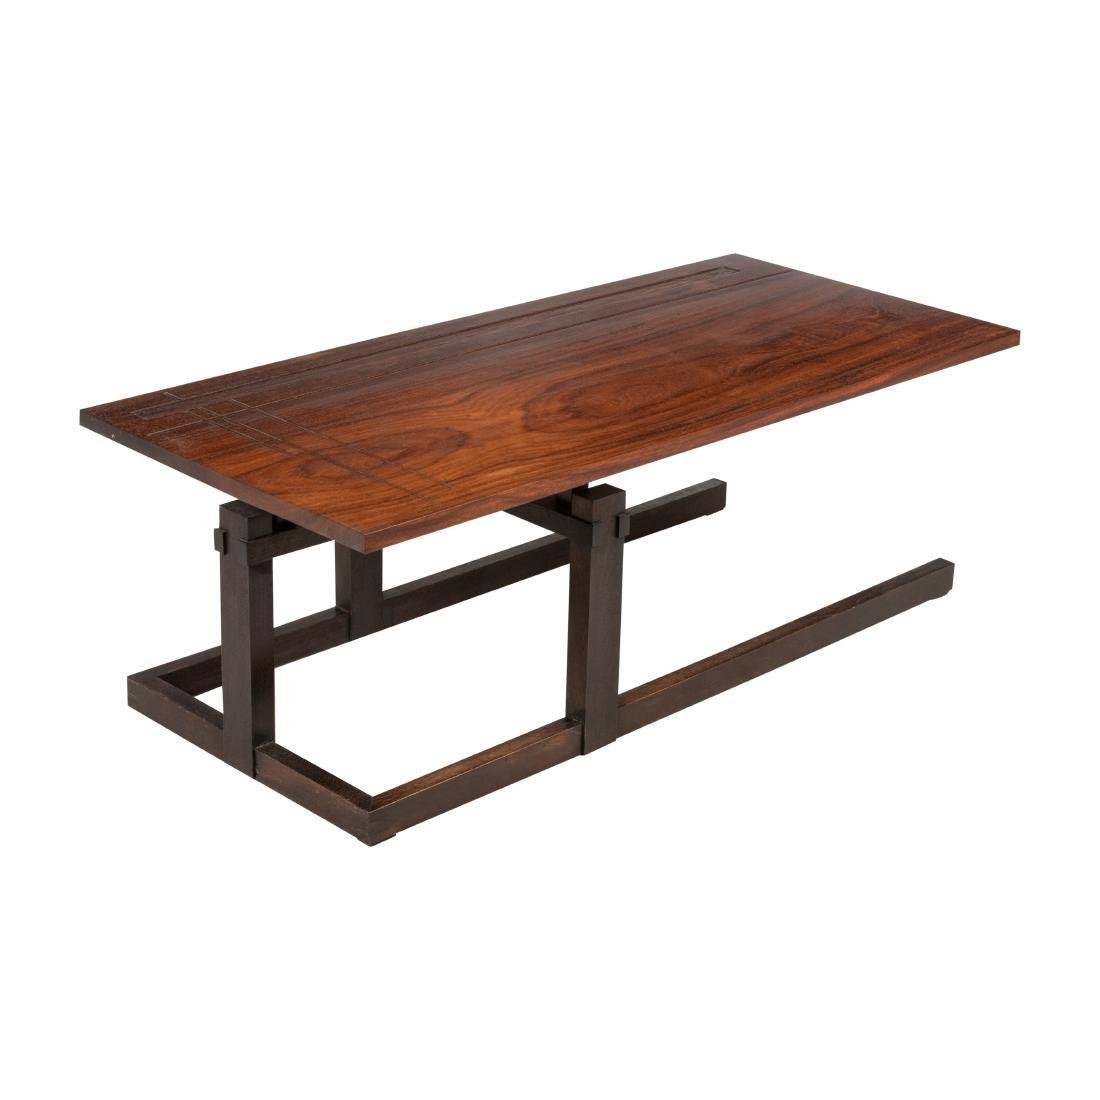 Thomas Swift - Coffee Table